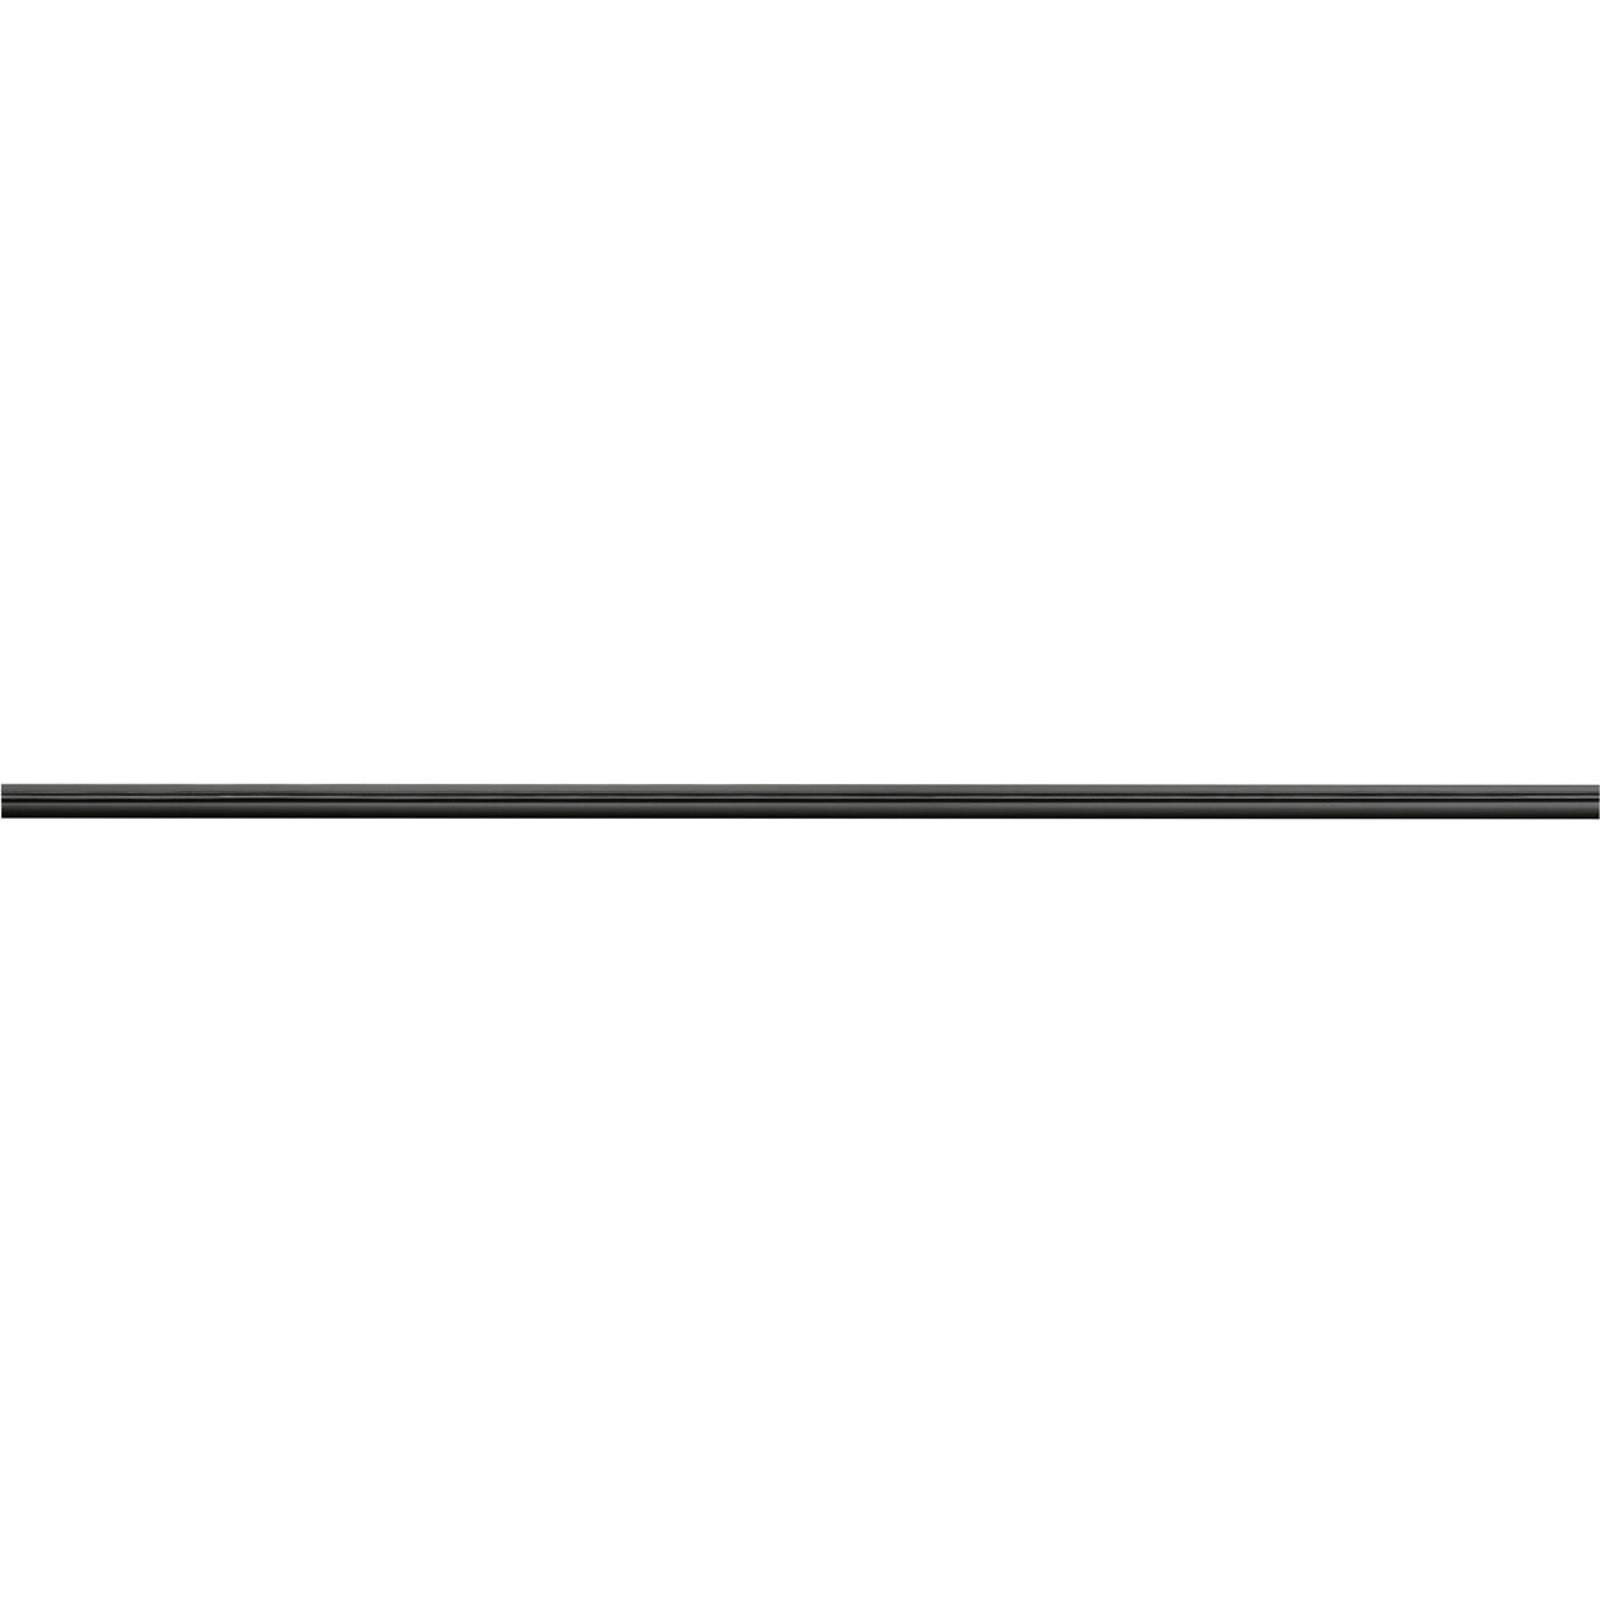 SLV EASYTEC II -kisko 230V, 2 m, musta